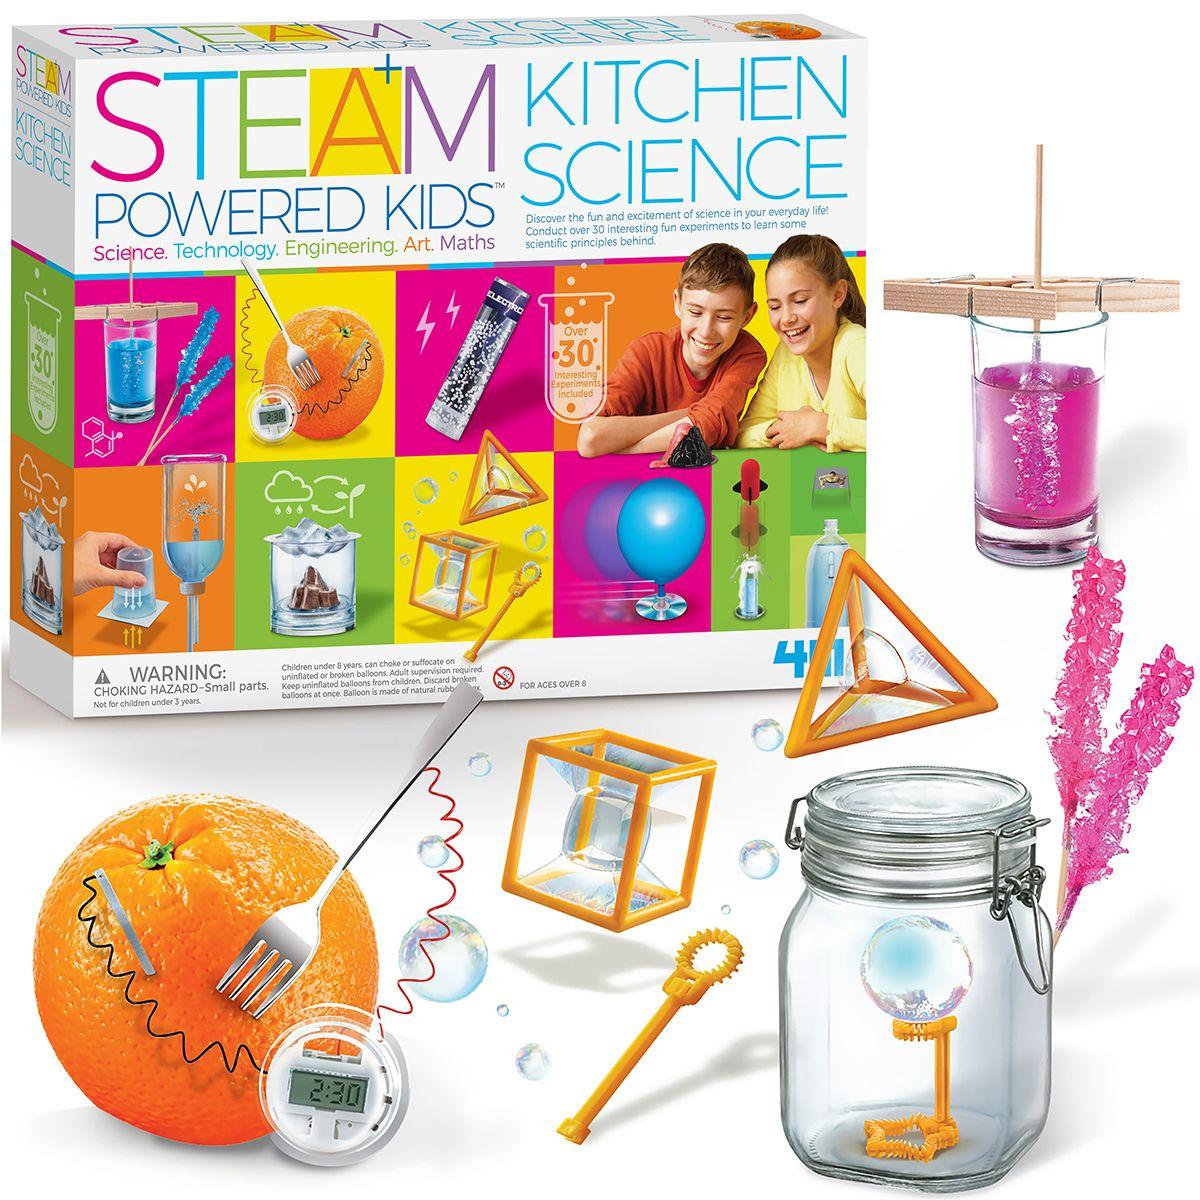 STEAM Powered Kids Deluxe Kitchen Science